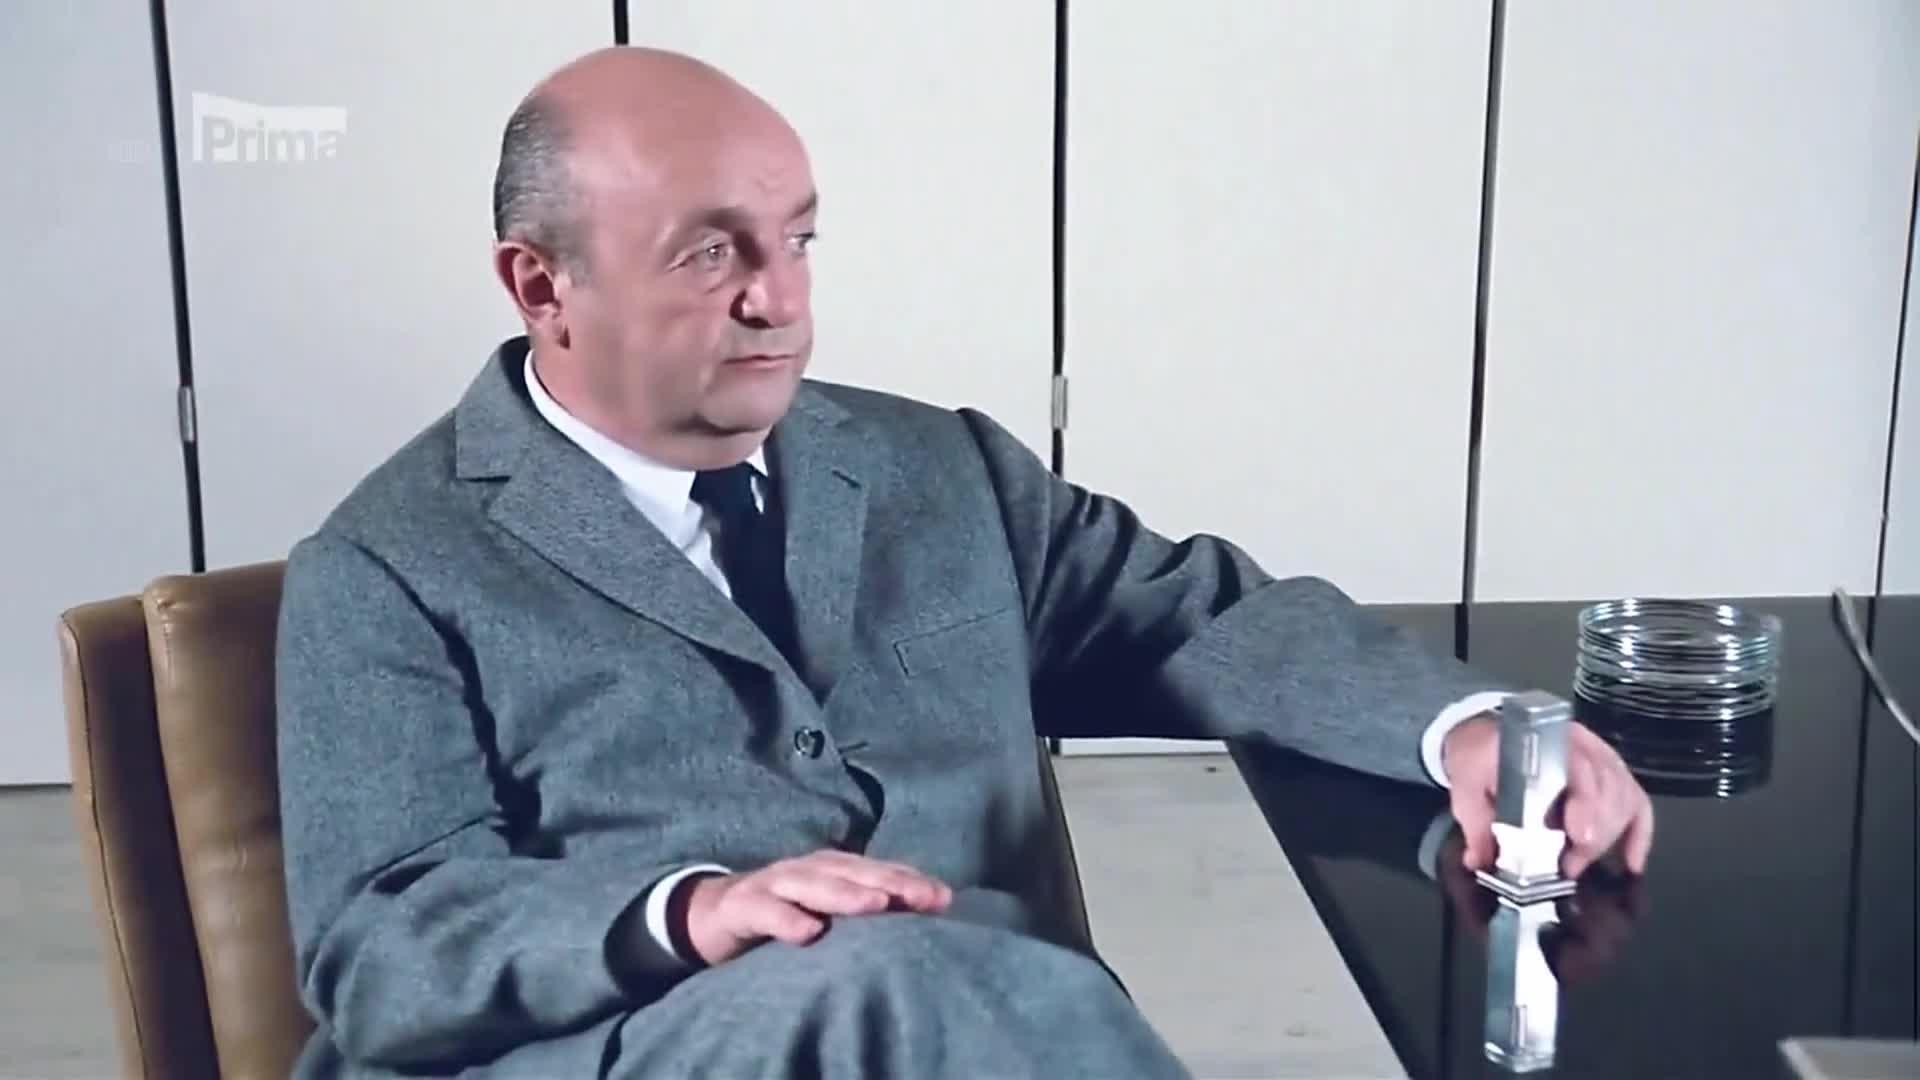 Velky blondyn s cernou botou  Pierre Richard   1972   cz dabing